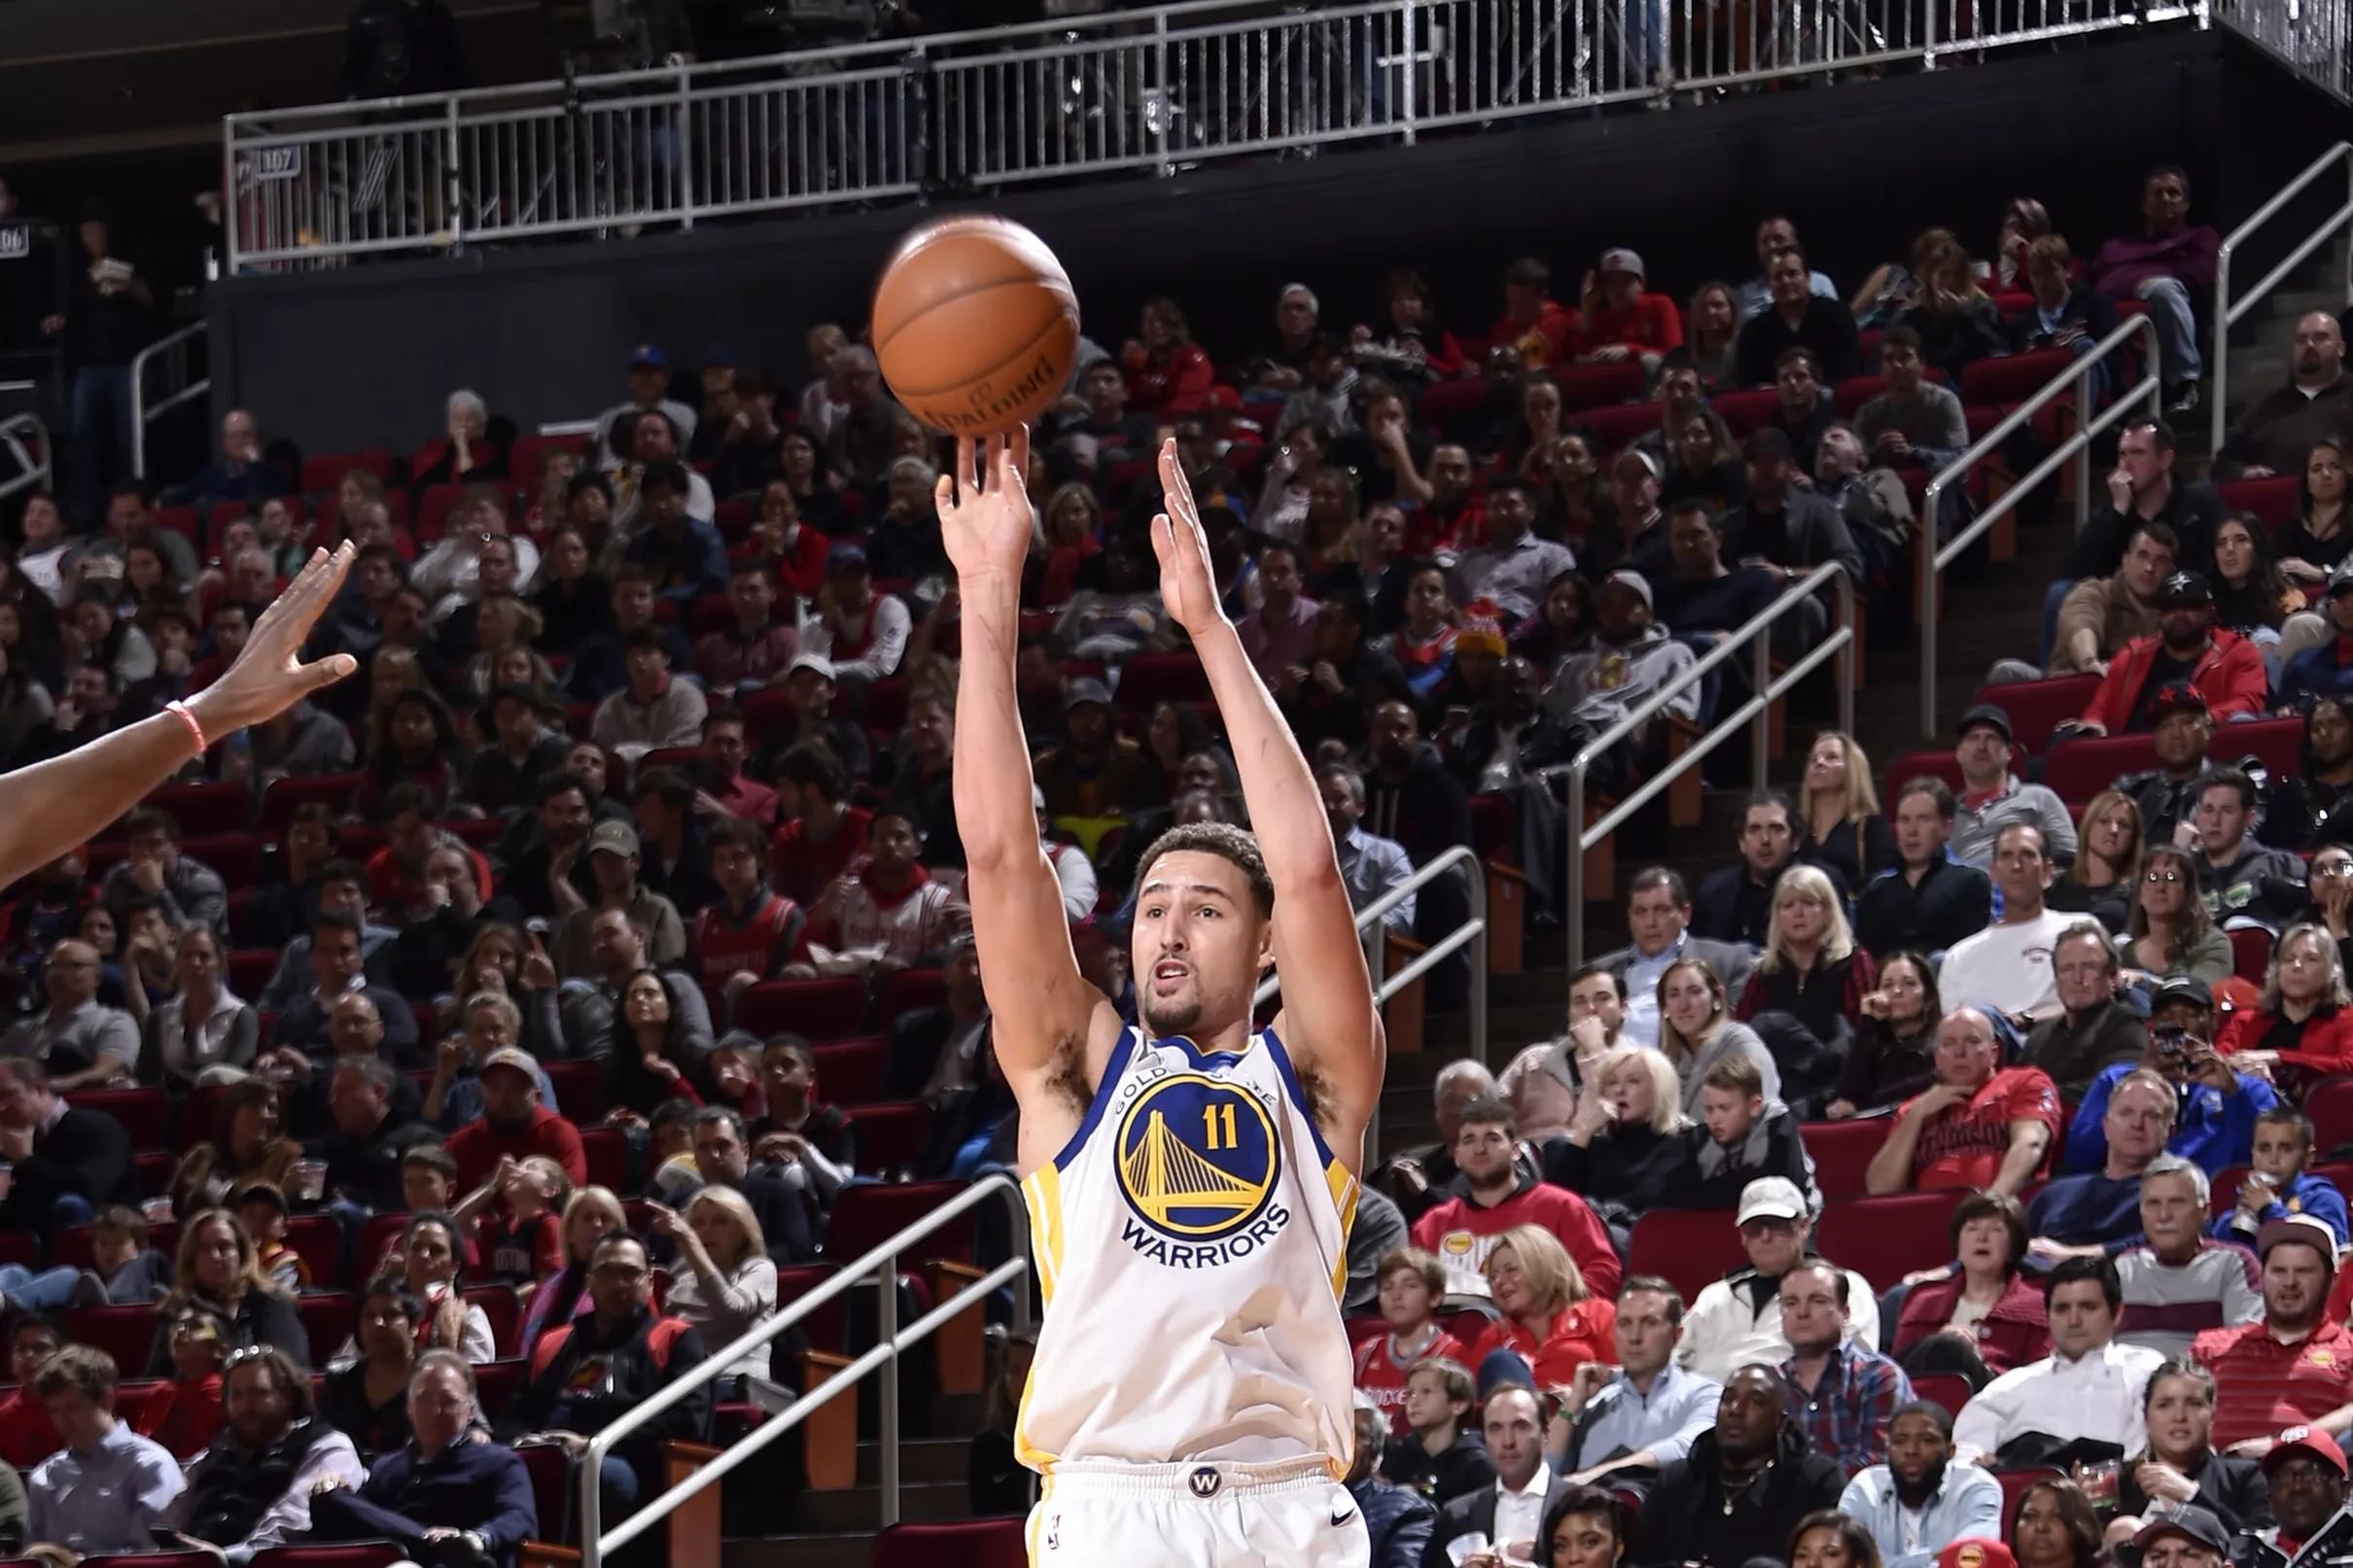 Warriors vs. Rockets. Final Score: Golden State walks away with a thrilling 124-114 win